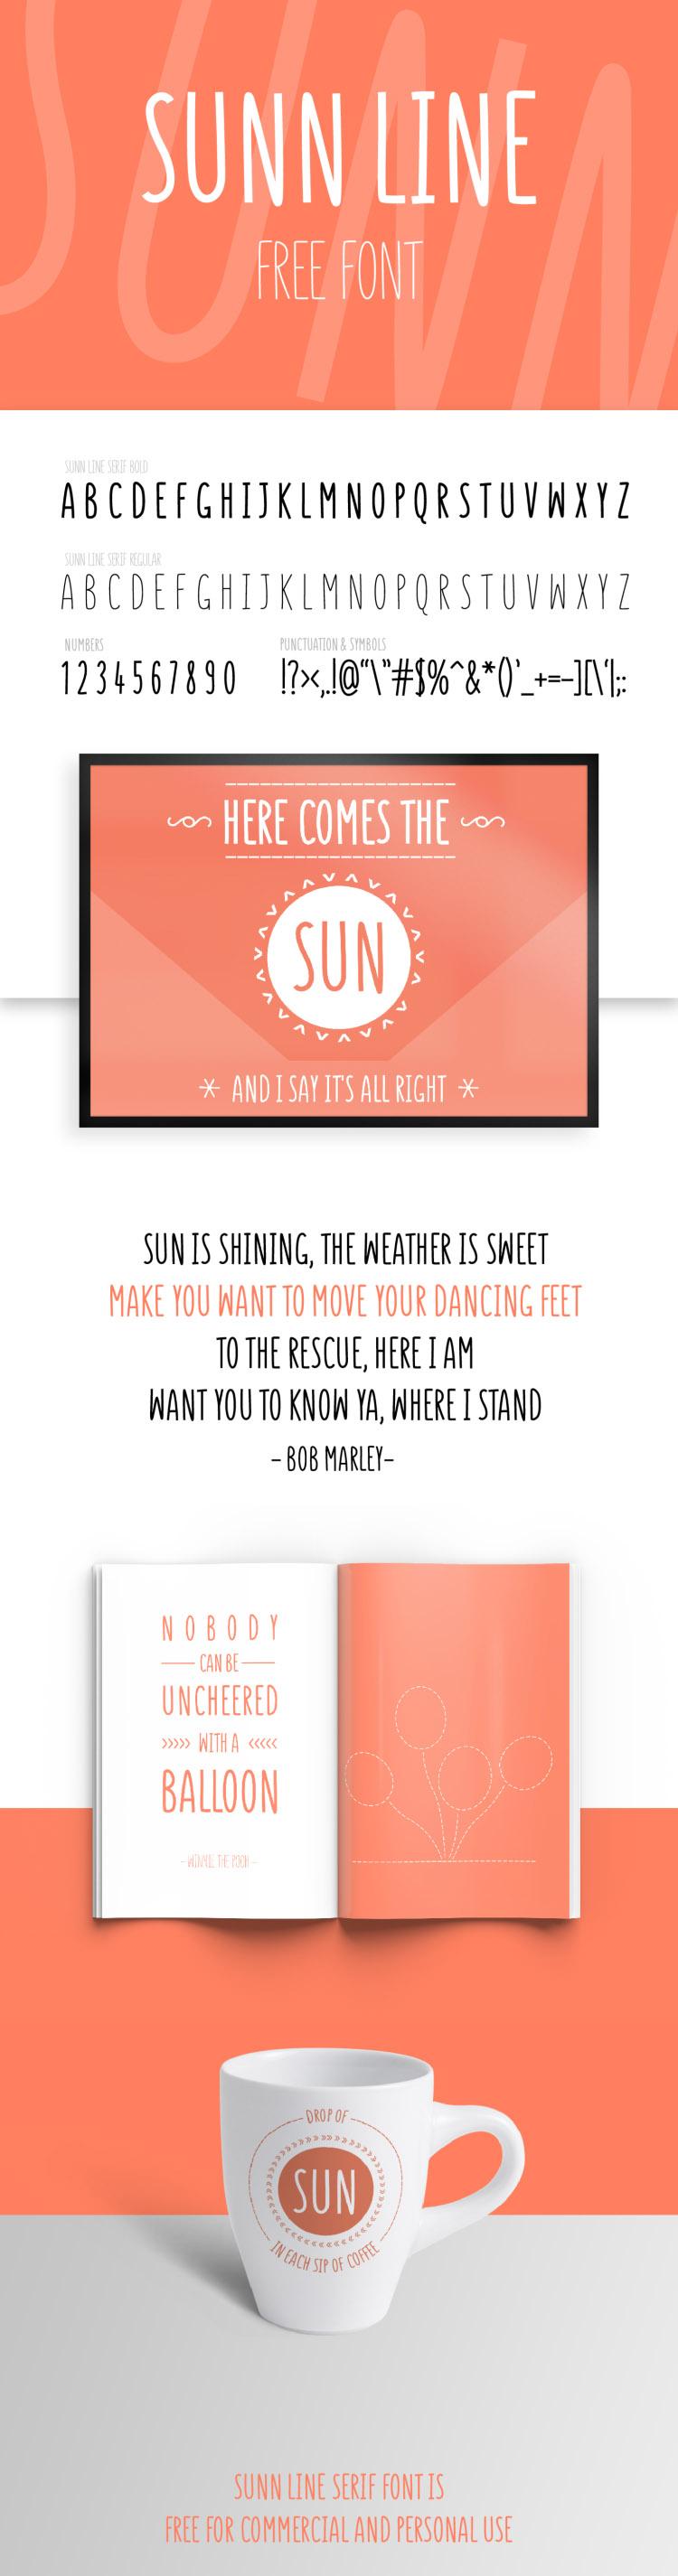 SUNN Line Free Font